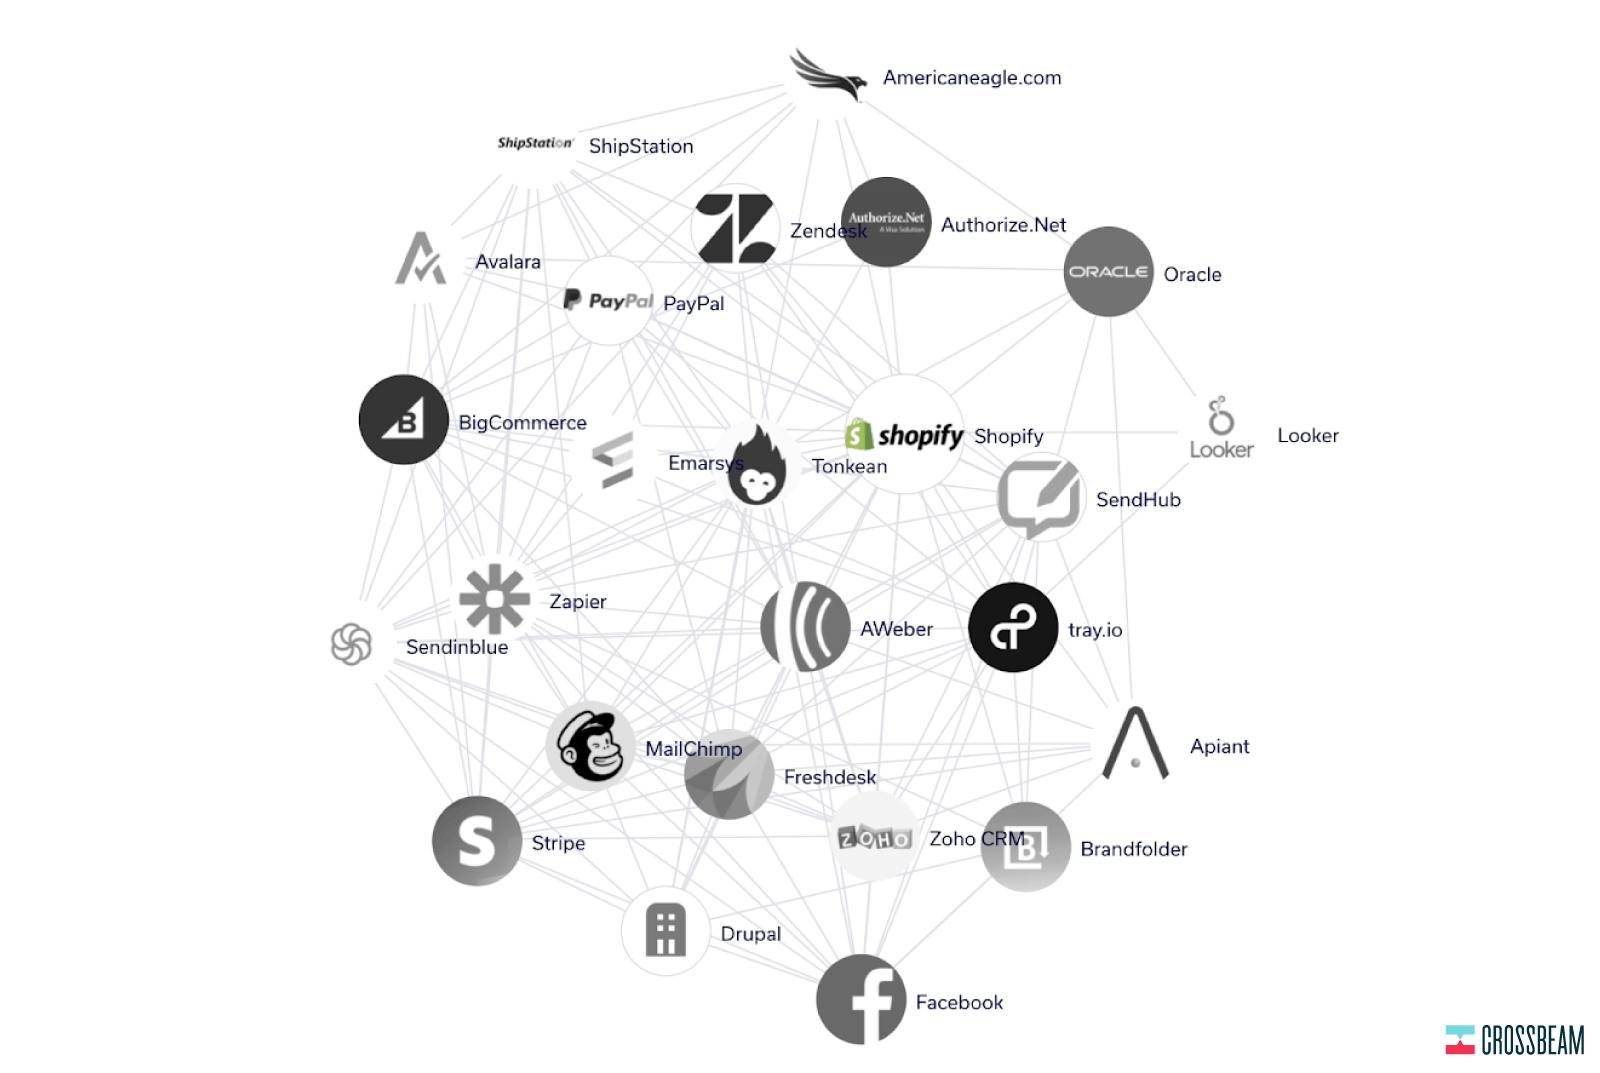 crossbeam-shopify-partner-ecosystem